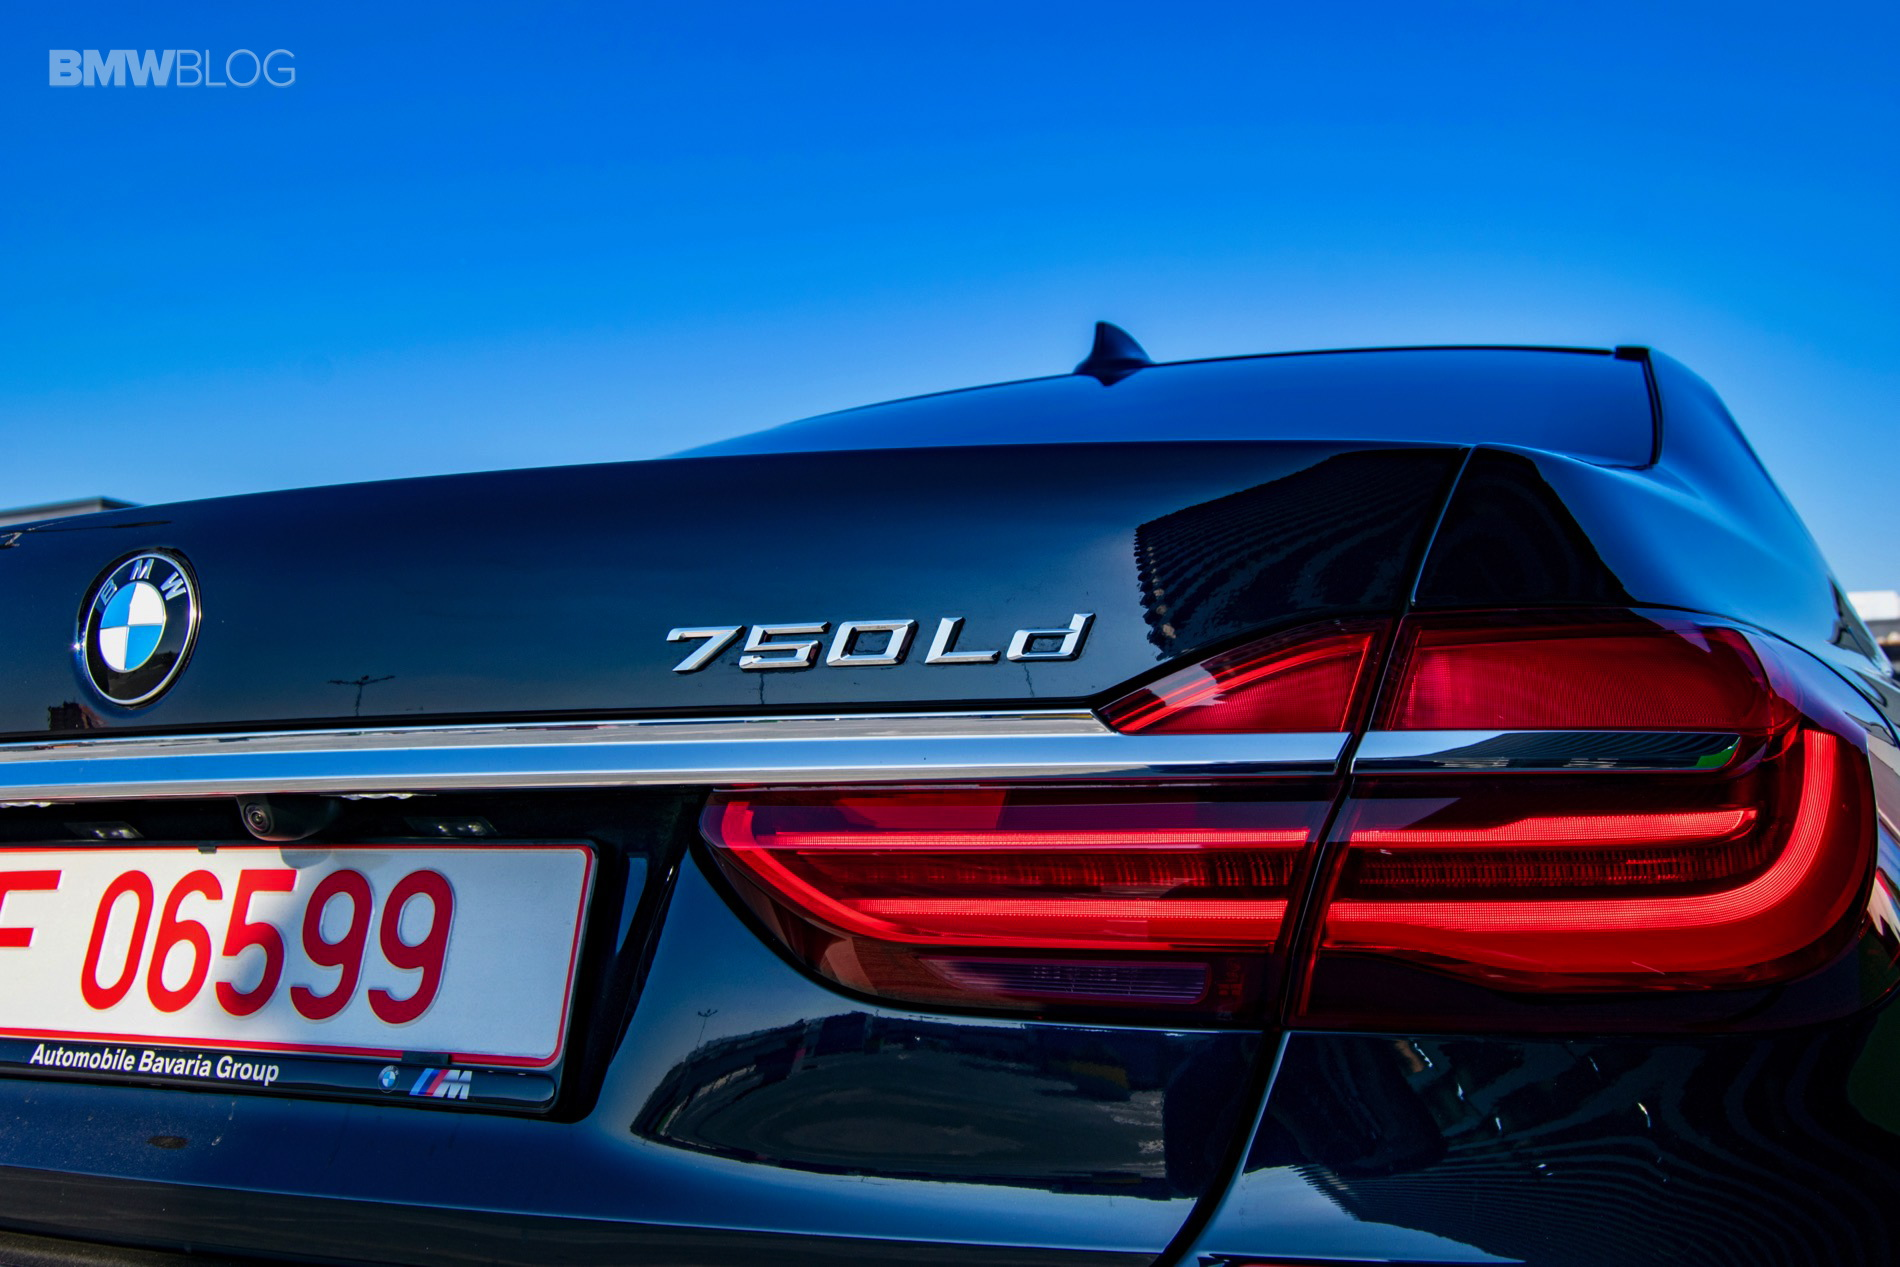 2017 BMW 750Ld test drive6